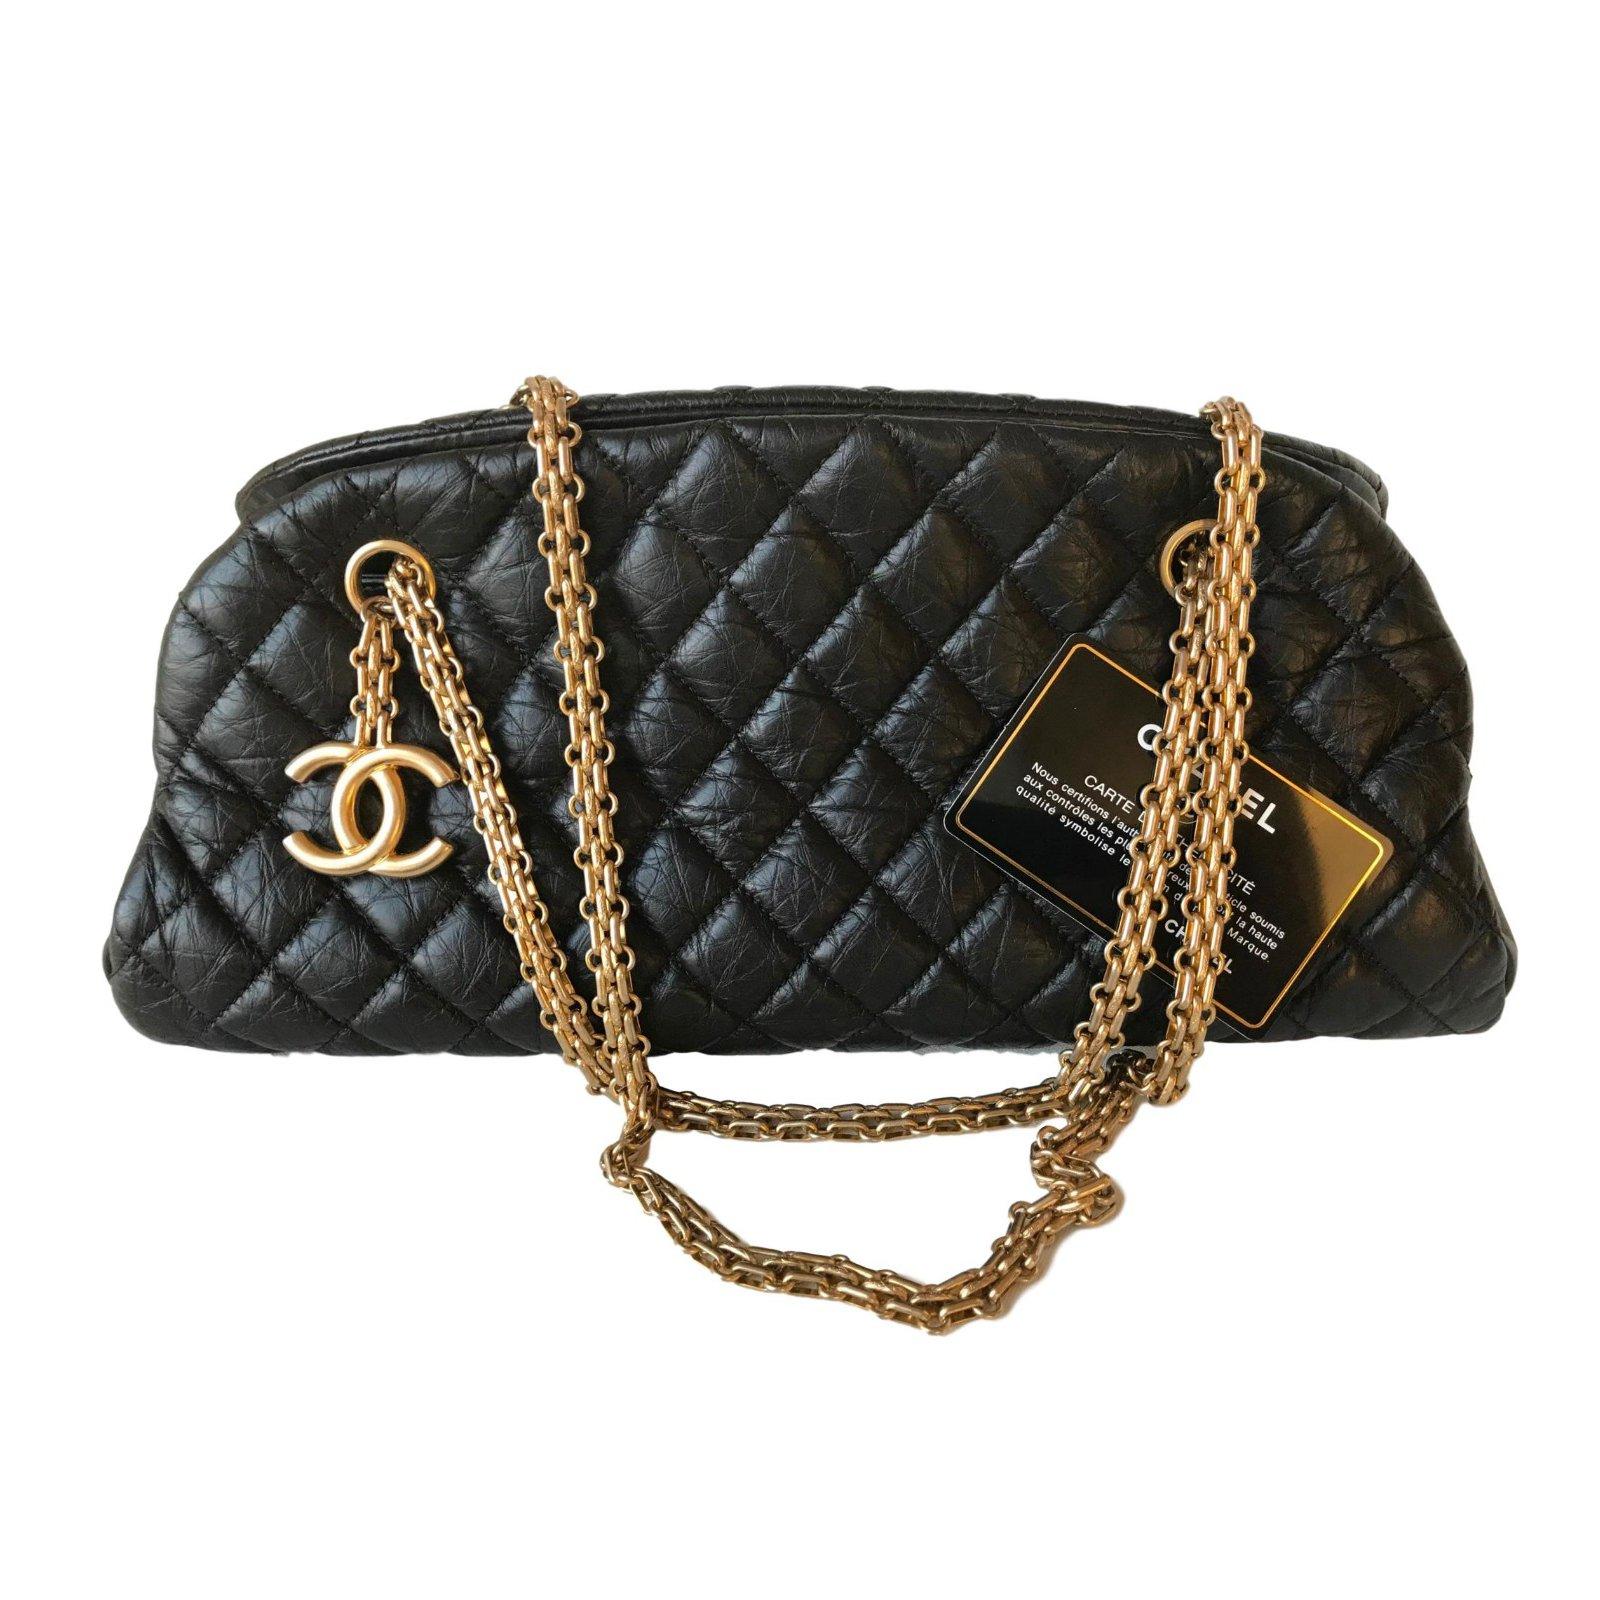 Chanel Chain Mademoie Bowling Bag Handbags Leather Black Ref 77671